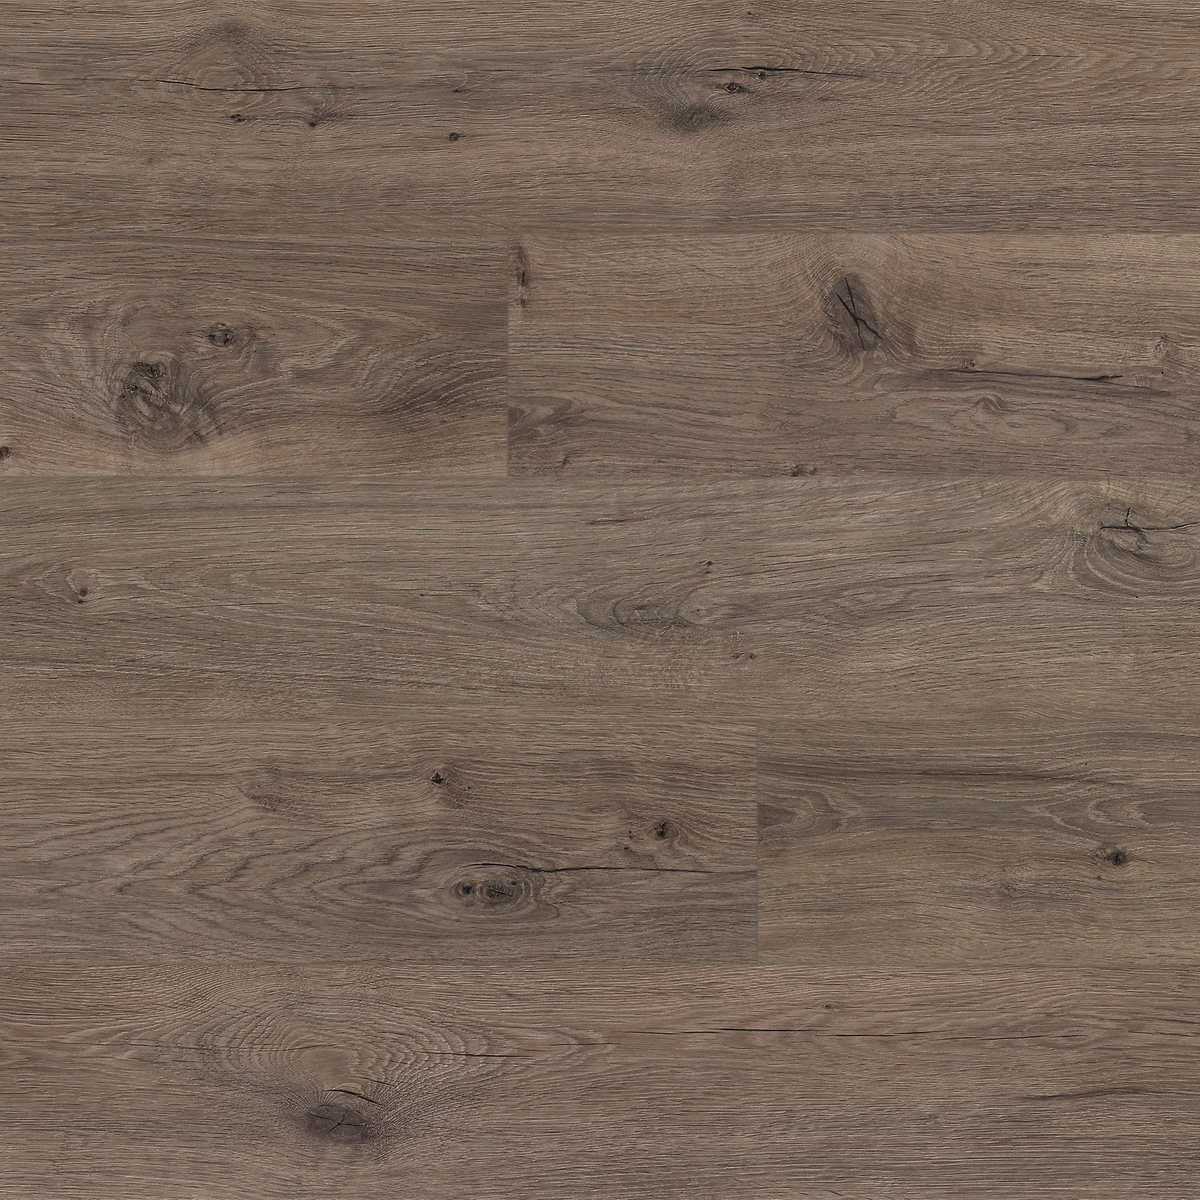 Costco $1.36/sqft Harmonics Silverleaf Oak Laminate Flooring 22.08 SQ FT Per Box